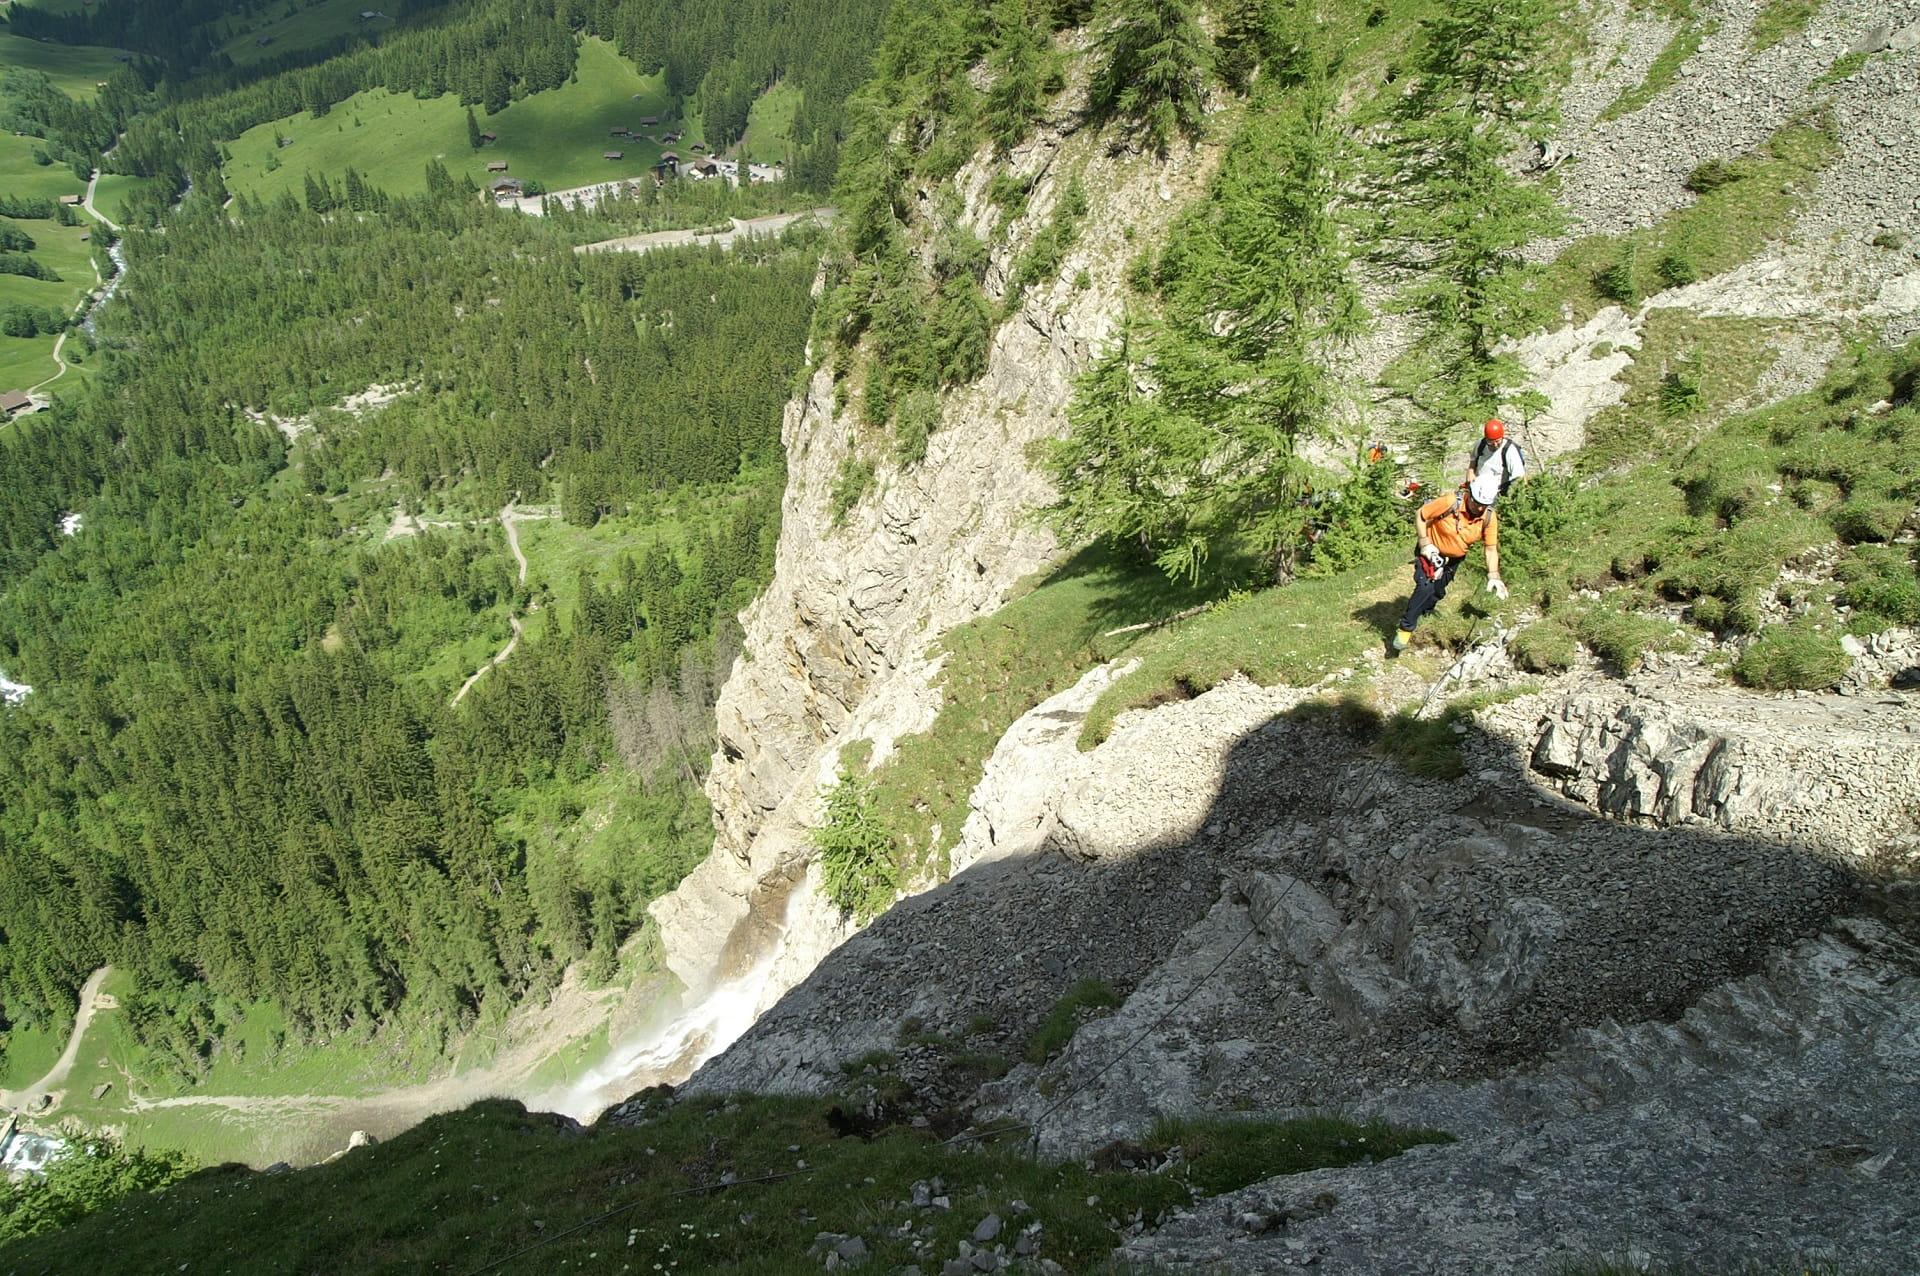 Klettersteig Adelboden : Engstligenalp klettersteig chäligang ausflüge